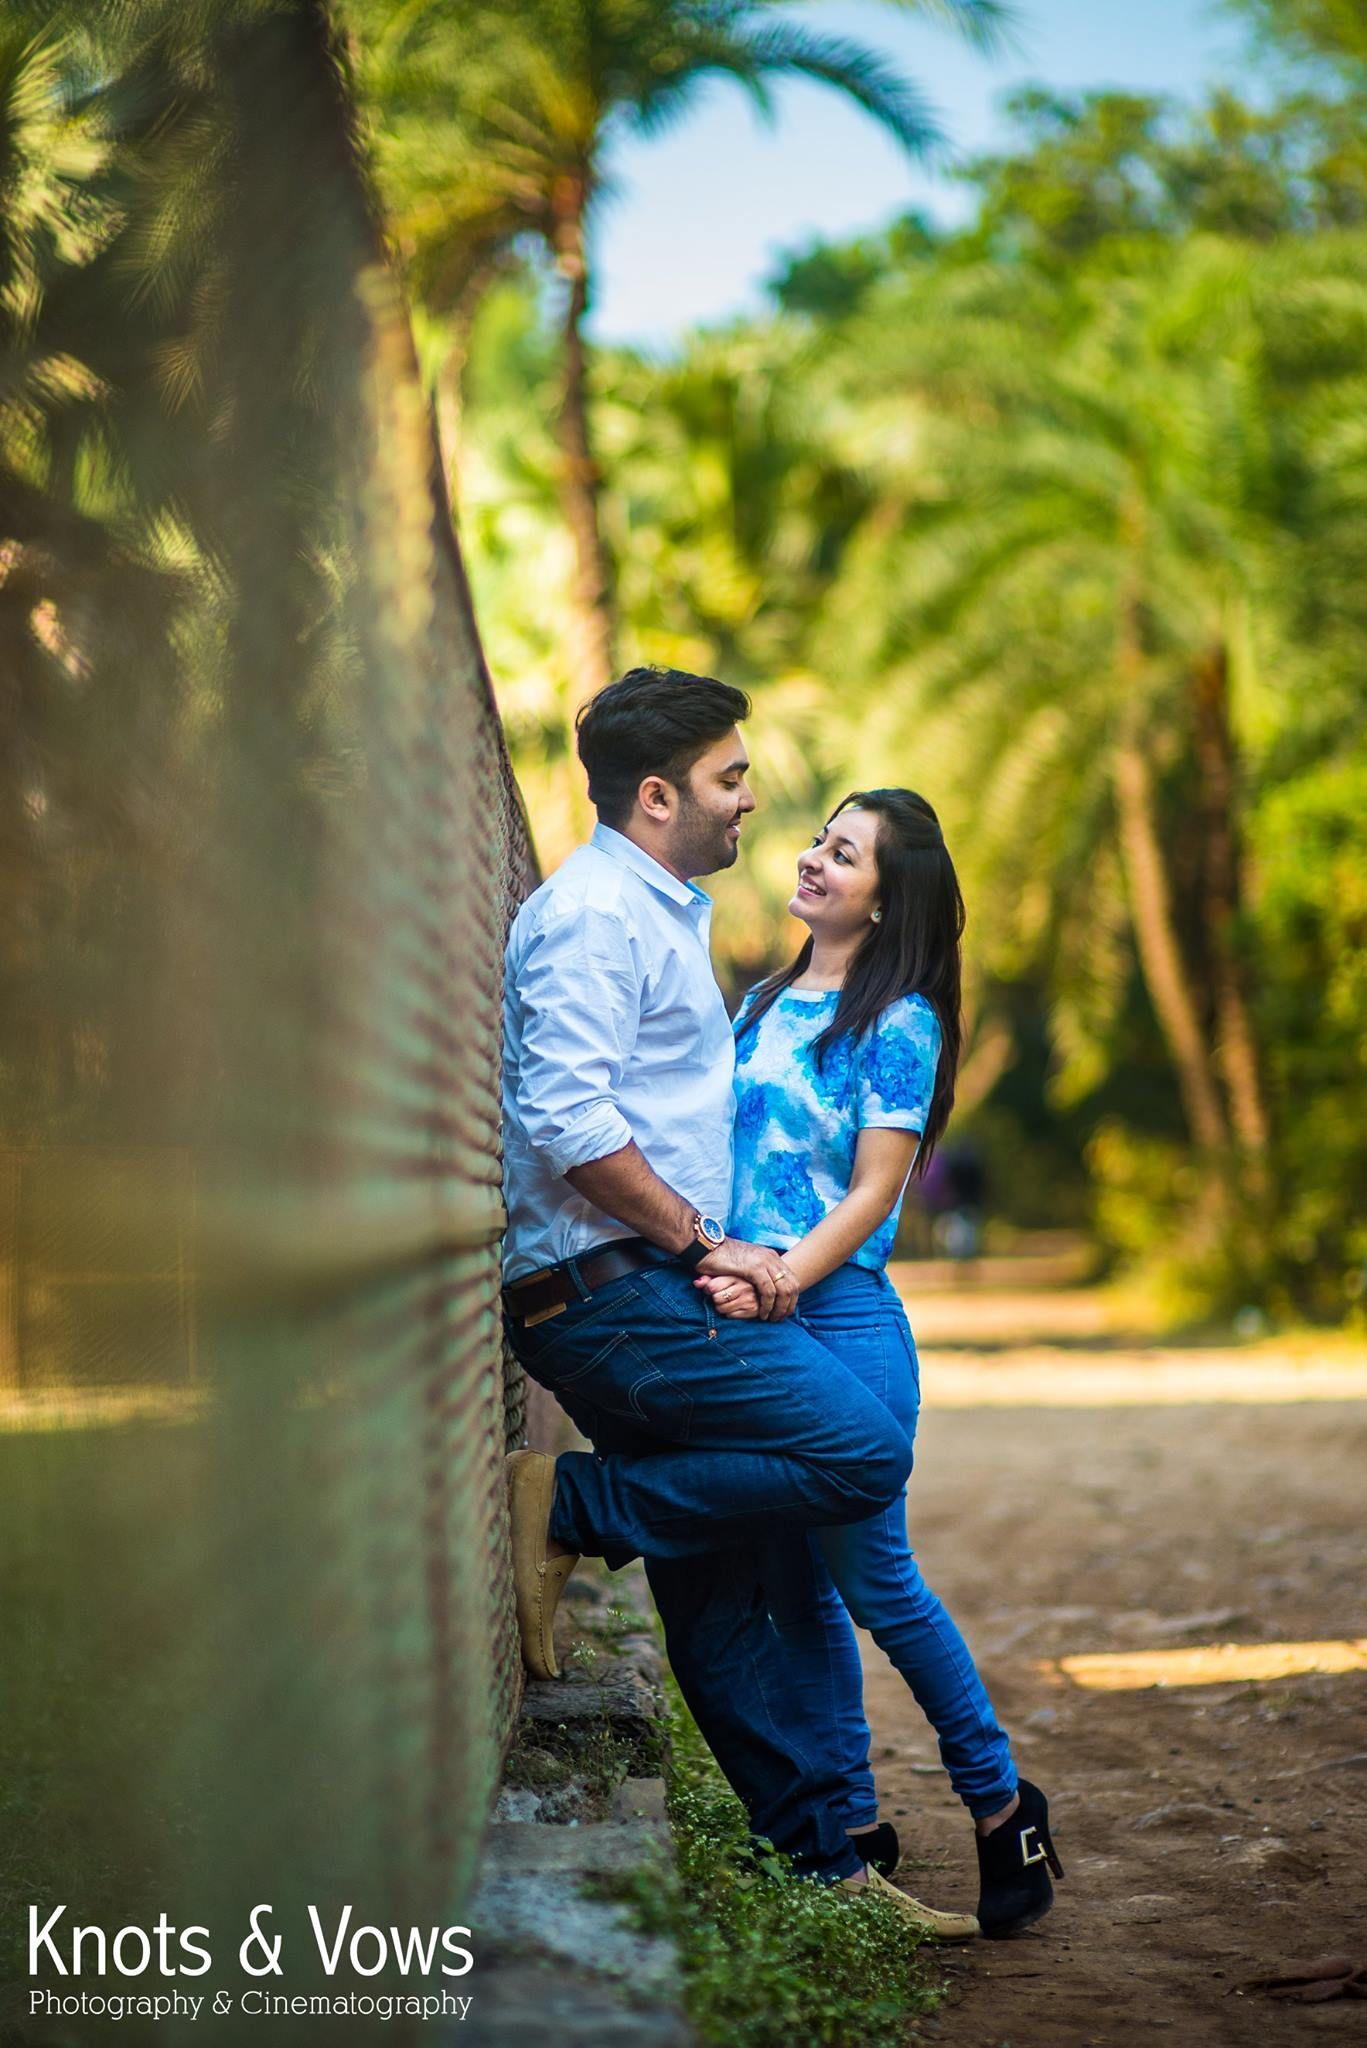 Pre-wedding shoot of Pinkesh & Karishma, Lean on me. #